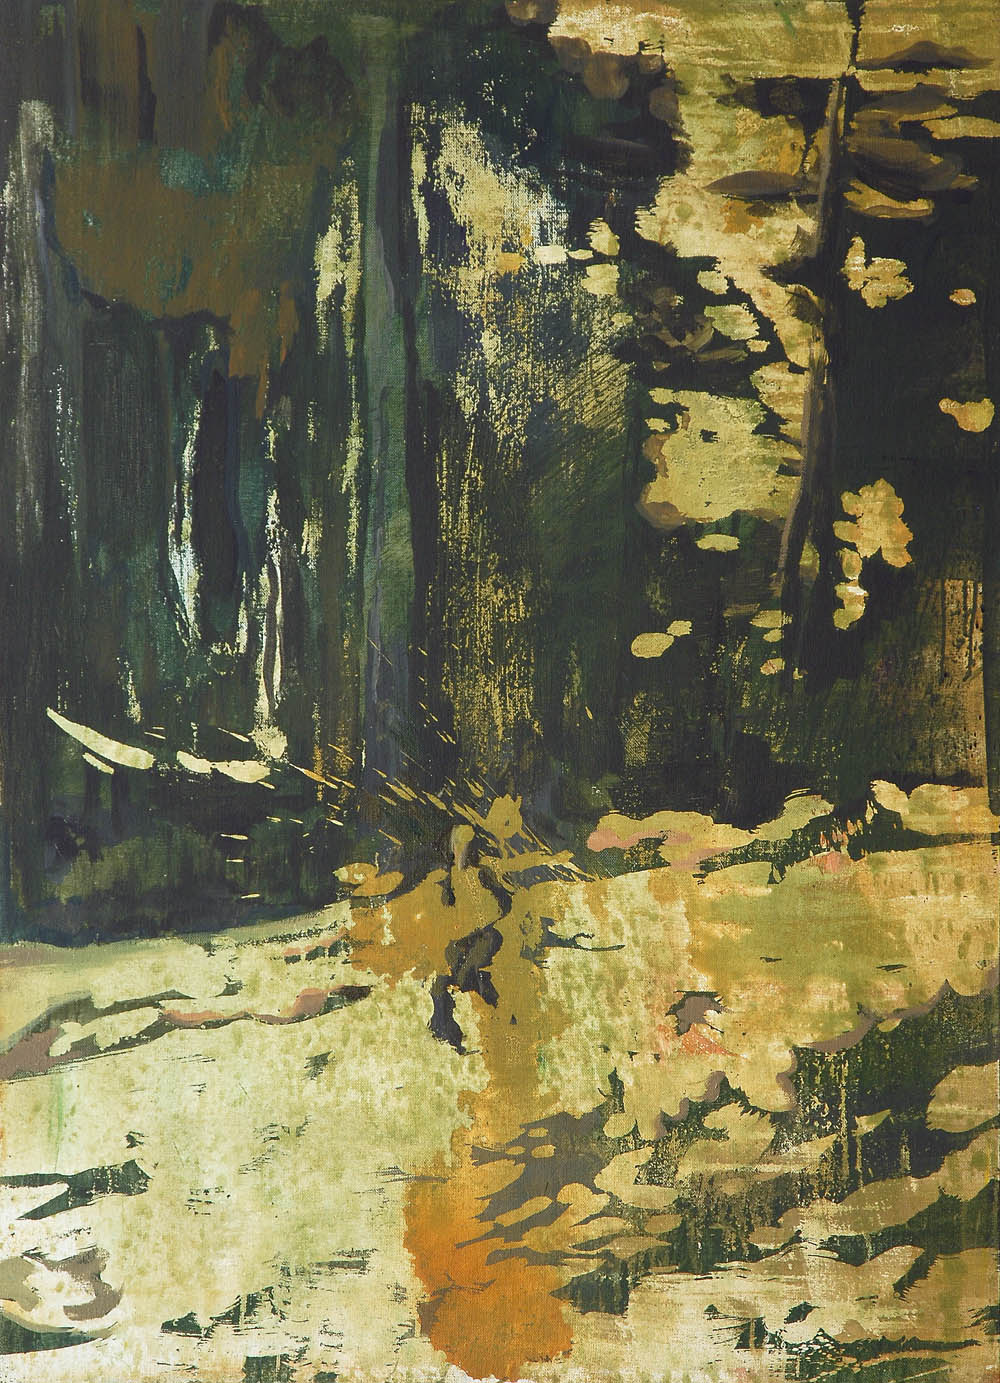 Lu Song 吕松, The Glad 林中空地, 2015, Oil on canvas 布面油画, 110 x 80 cm